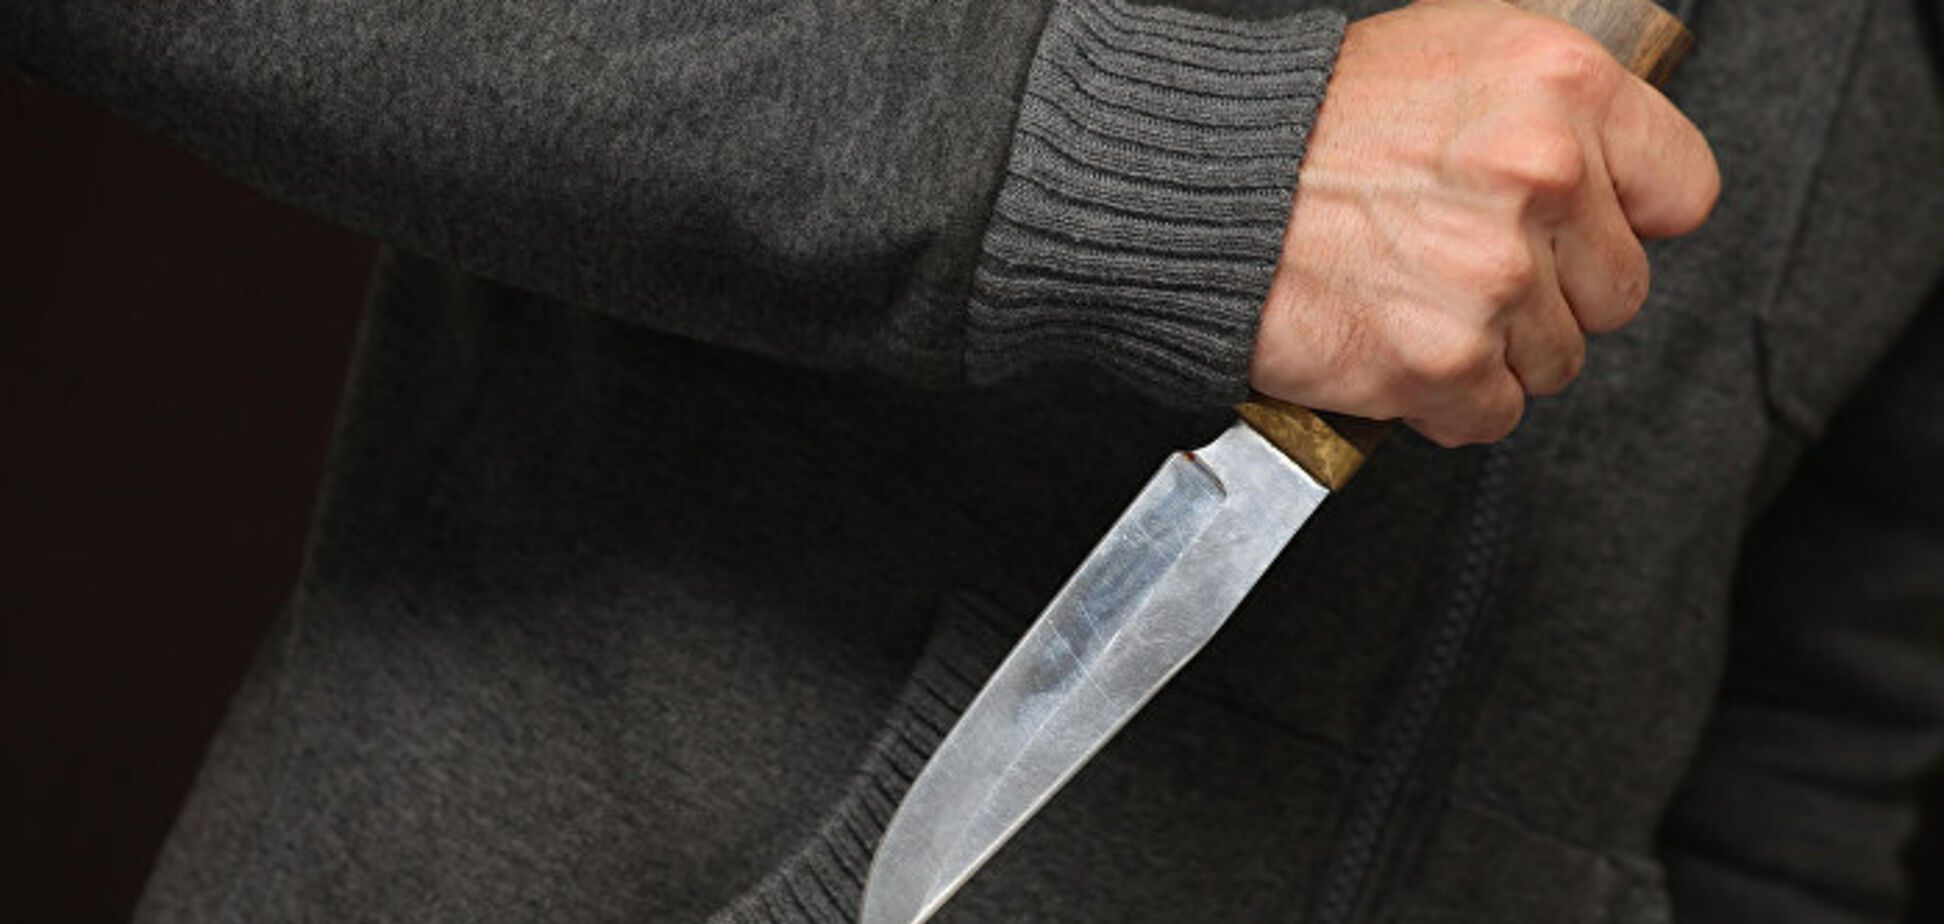 На Днепропетровщине поймали опасного преступника: подробности